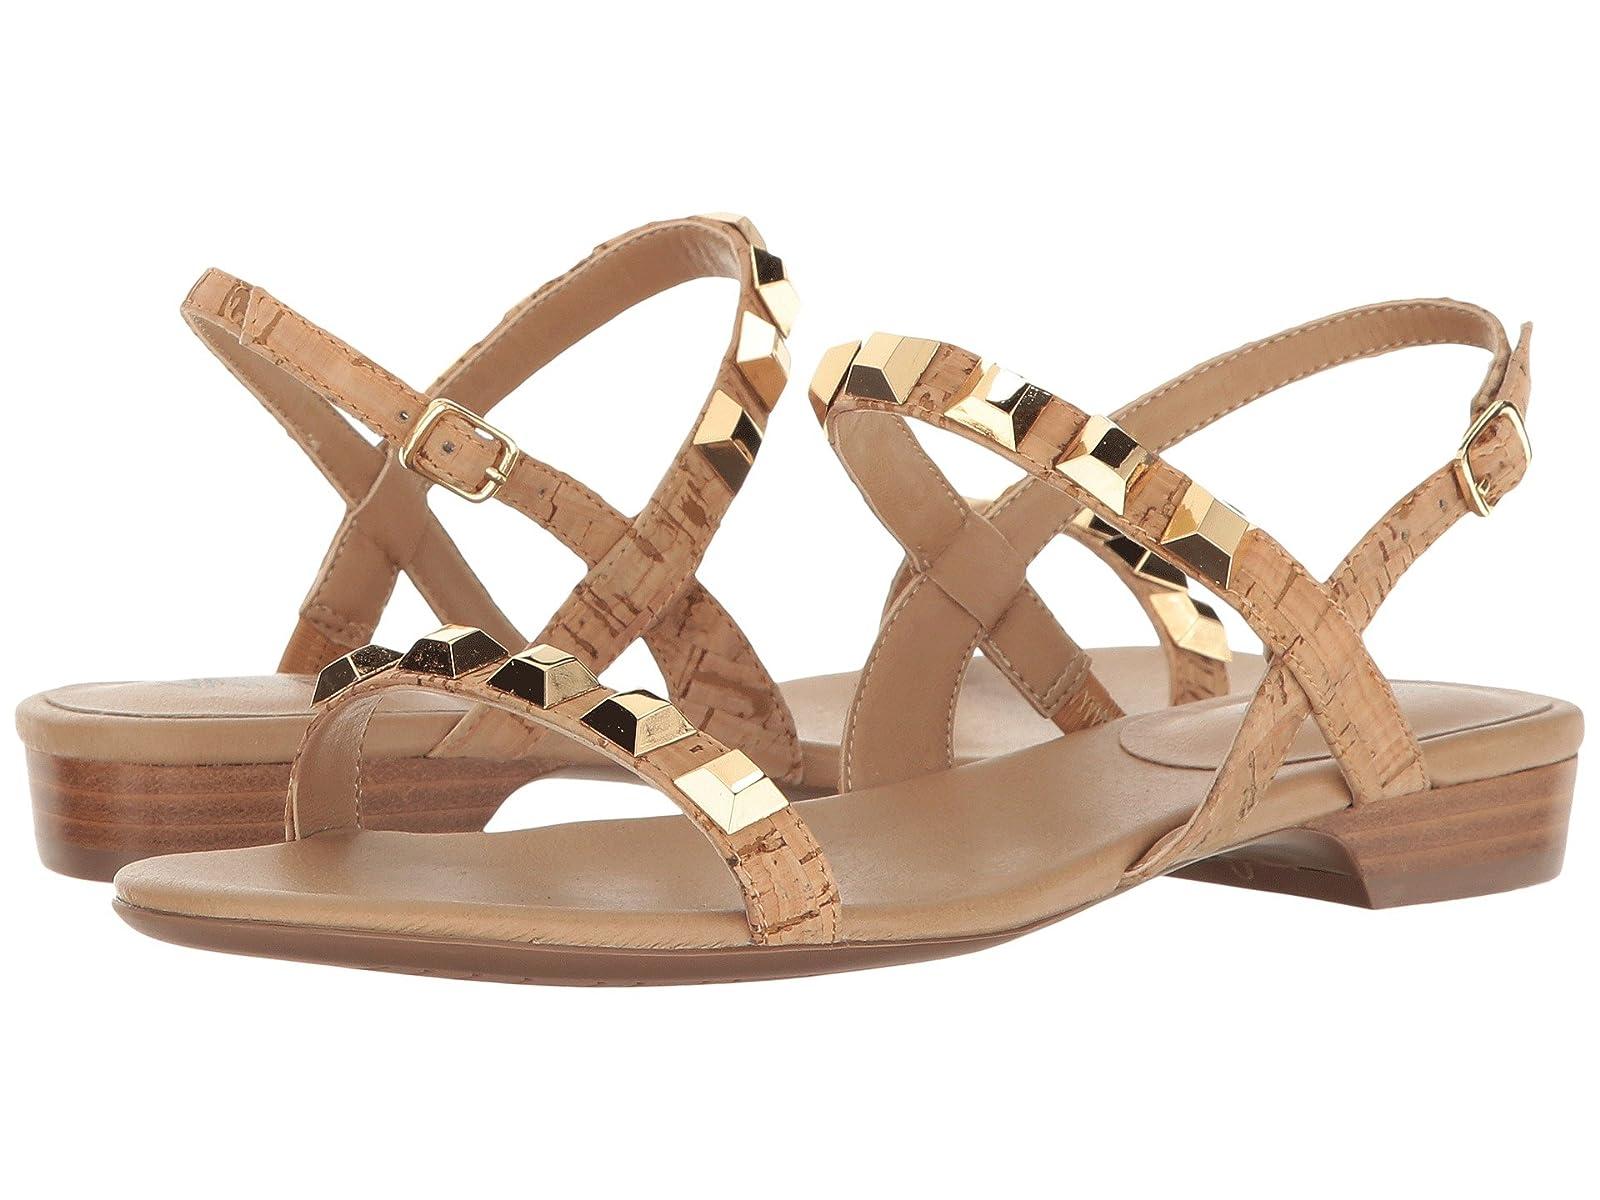 Vaneli BodiceaCheap and distinctive eye-catching shoes